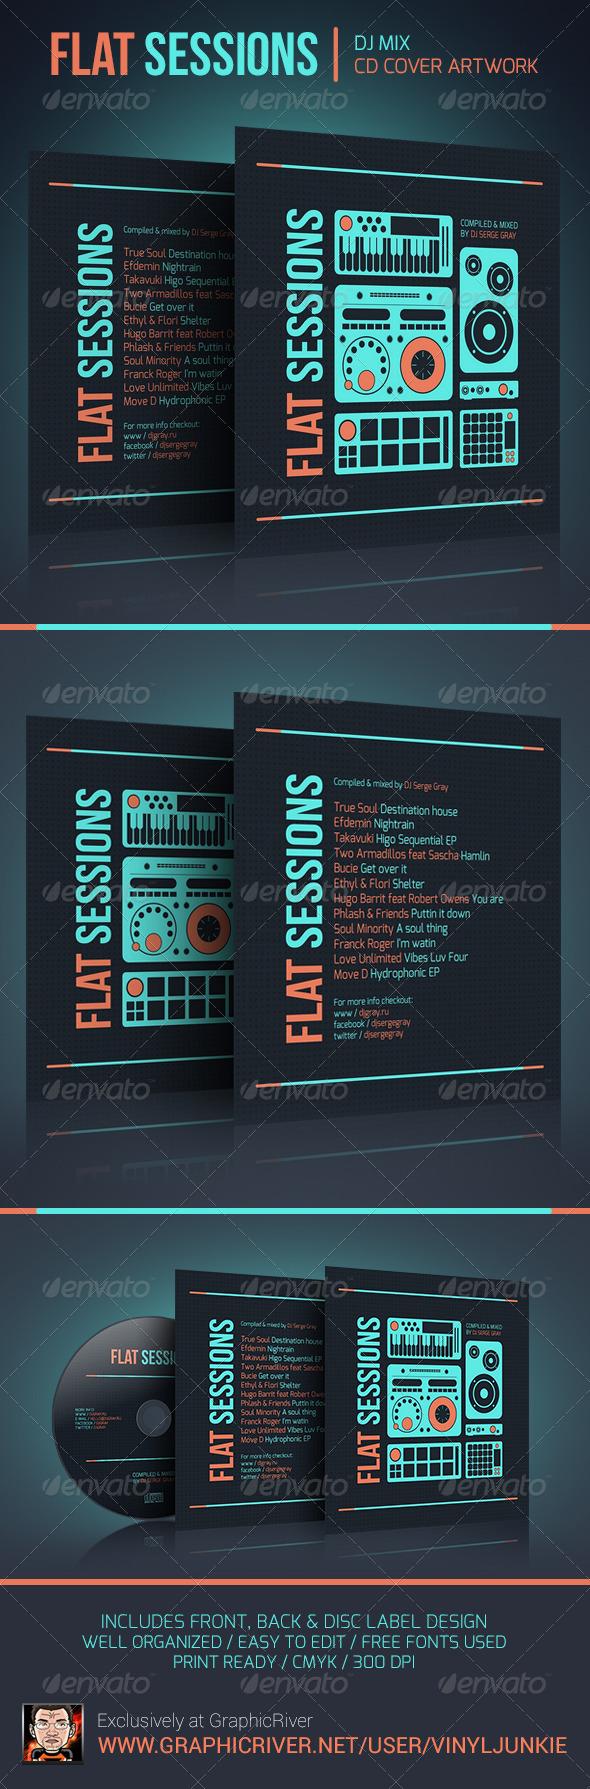 Flat Sessions - DJ Mix CD Cover Artwork - CD & DVD artwork Print Templates